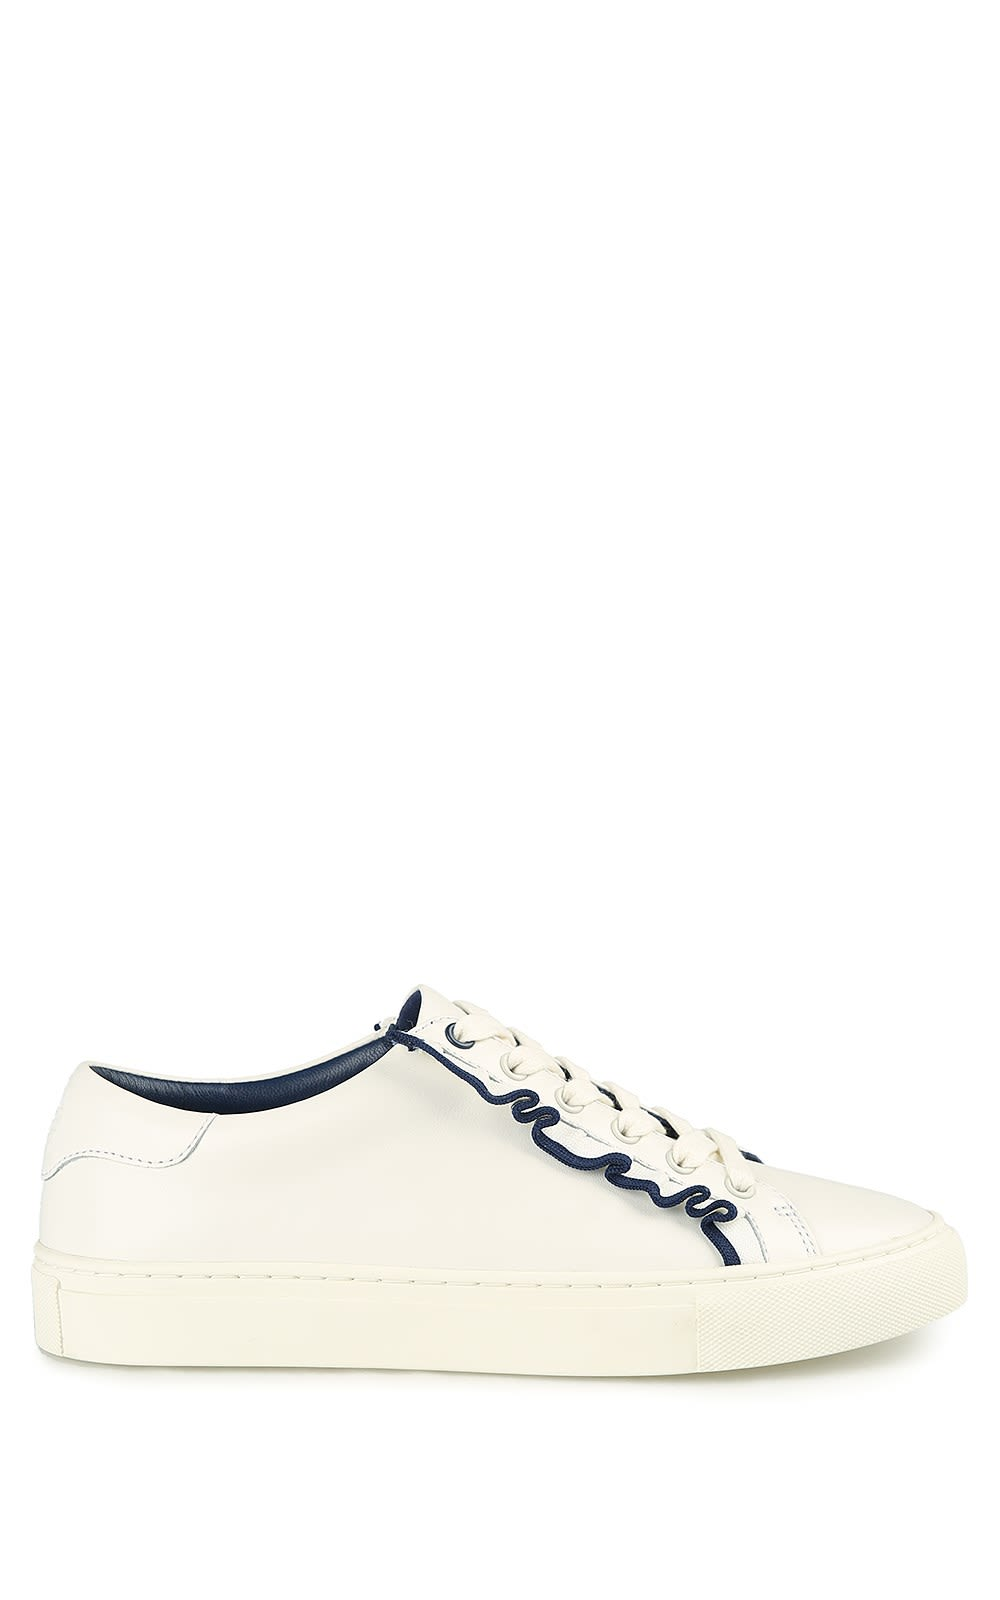 Tory Burch Tory Sport Ruffle-trim Leather Sneakers